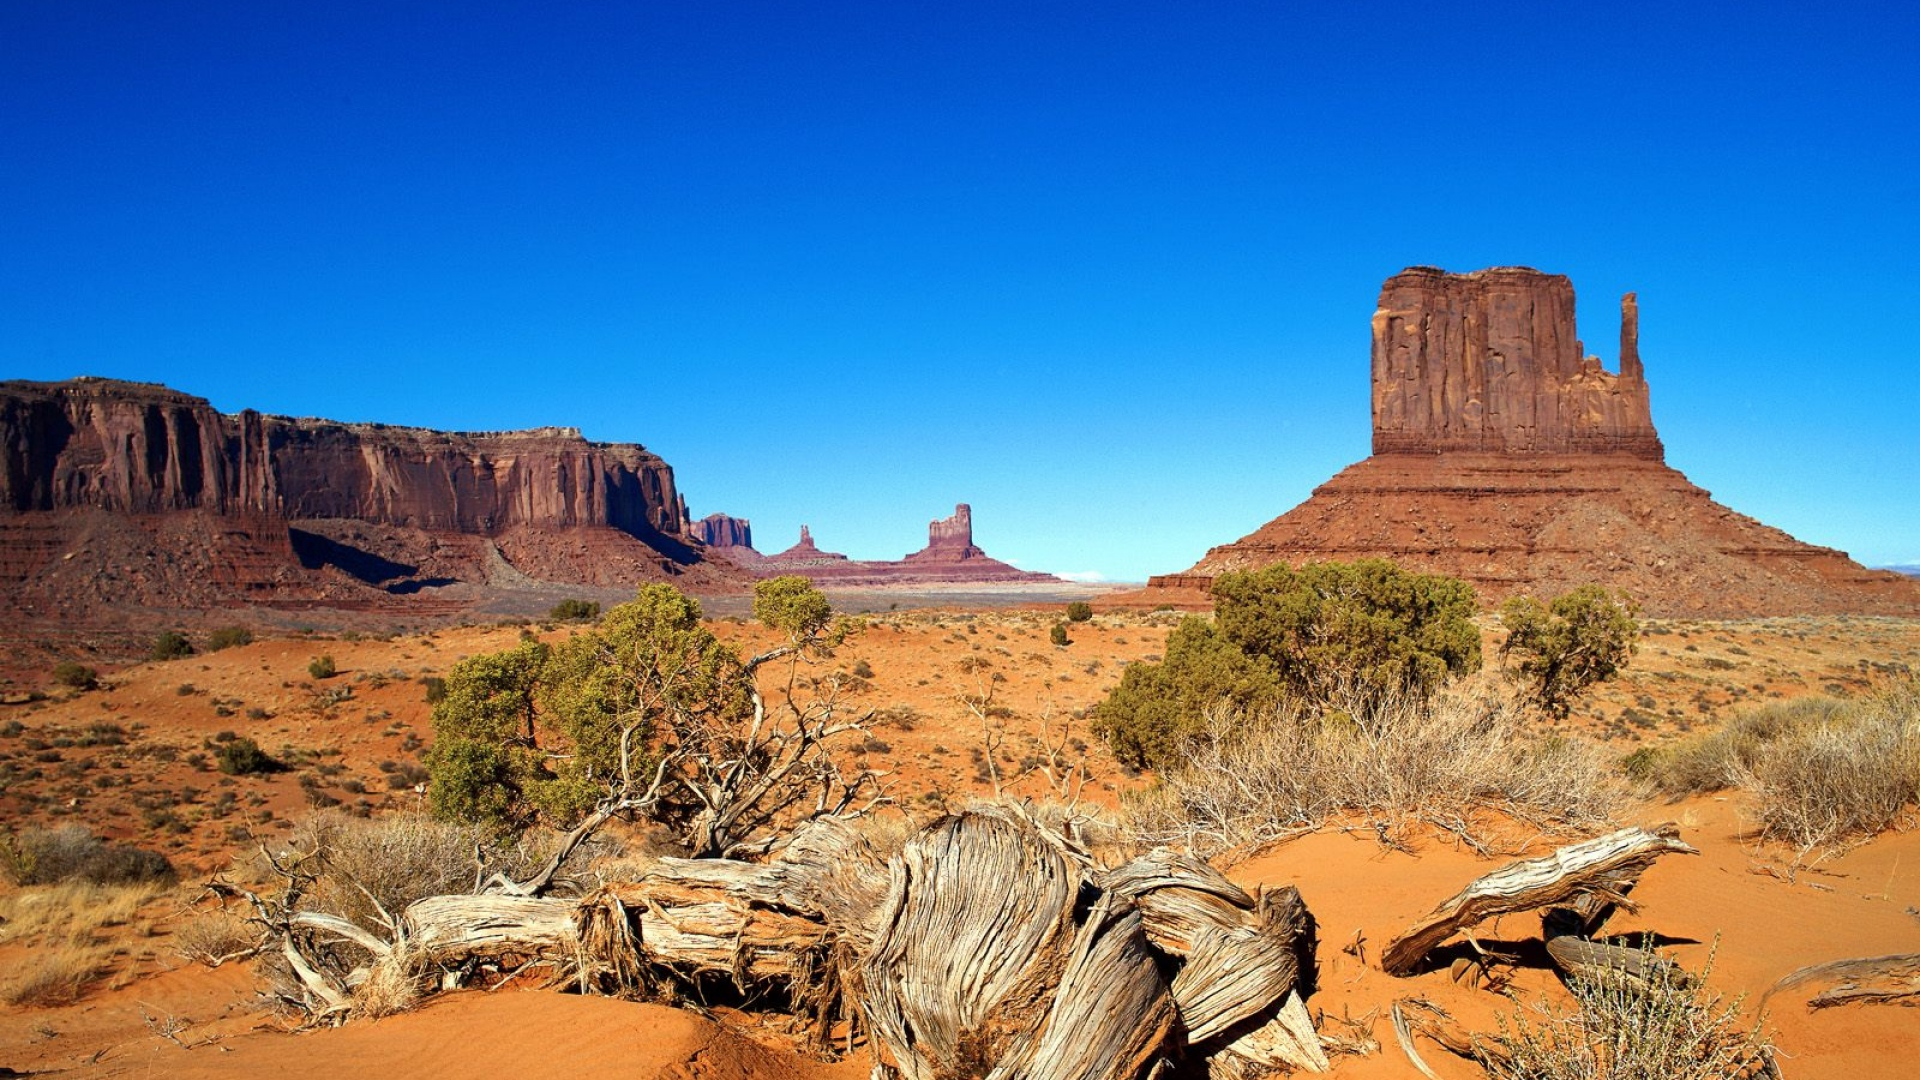 Microfungal oasis in an oligotrophic desert diversity